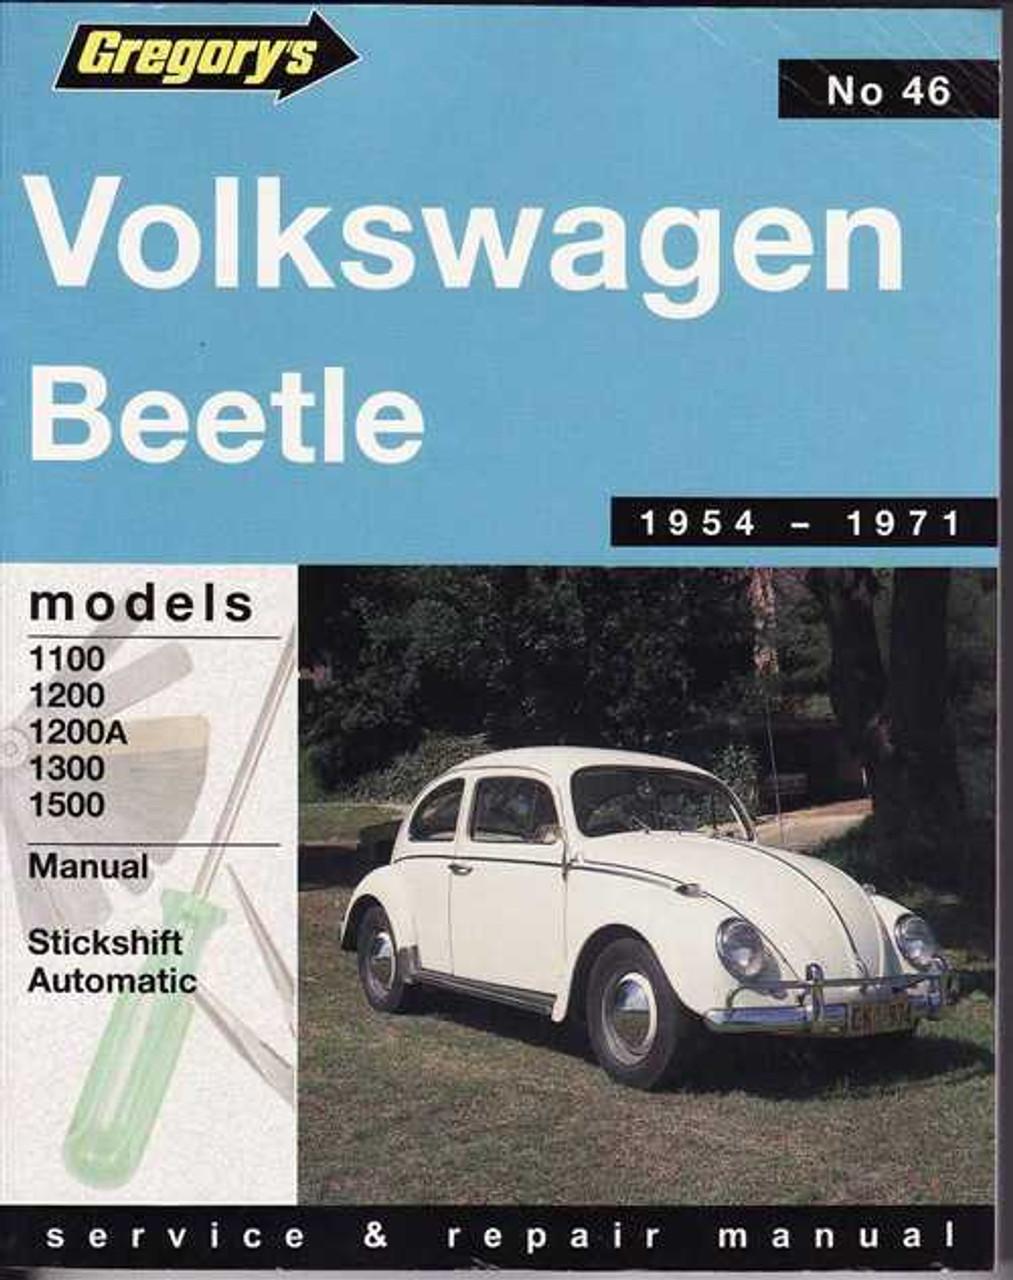 Volkswagen Beetle 1954 - 1971 Workshop Manual